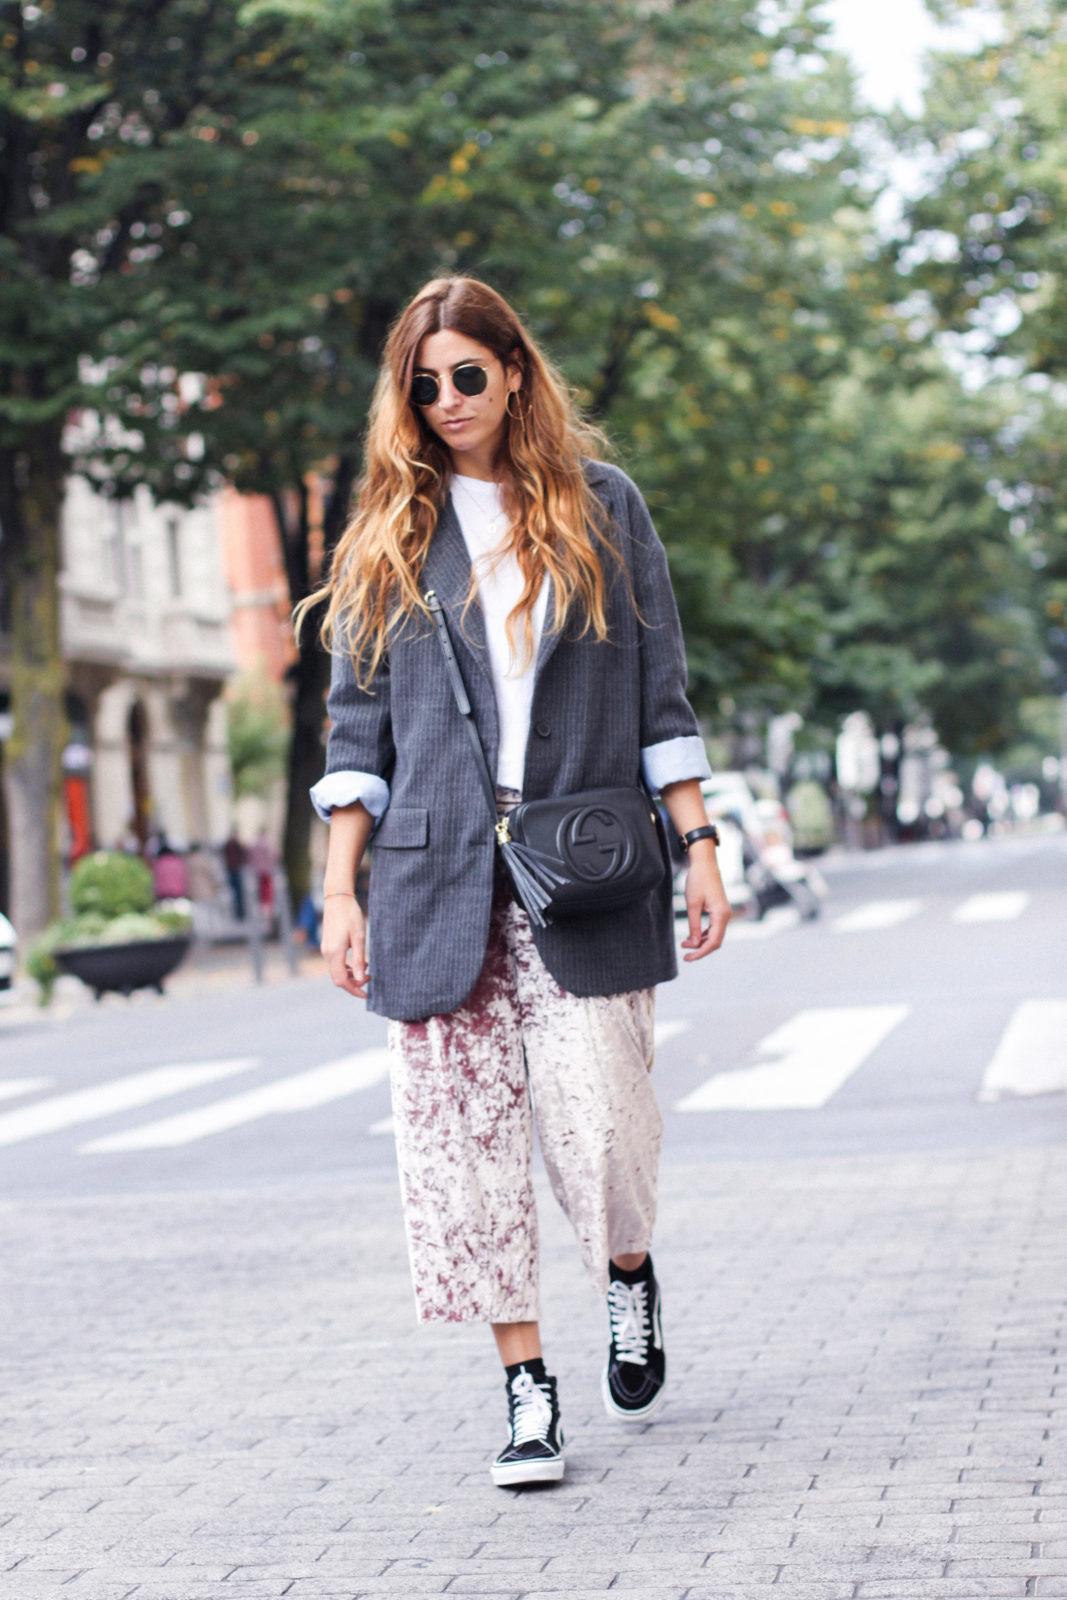 pantalones_terciopelo_rosa_pull_and_bear_blazer_vans_pendientes_aros_gucci-8